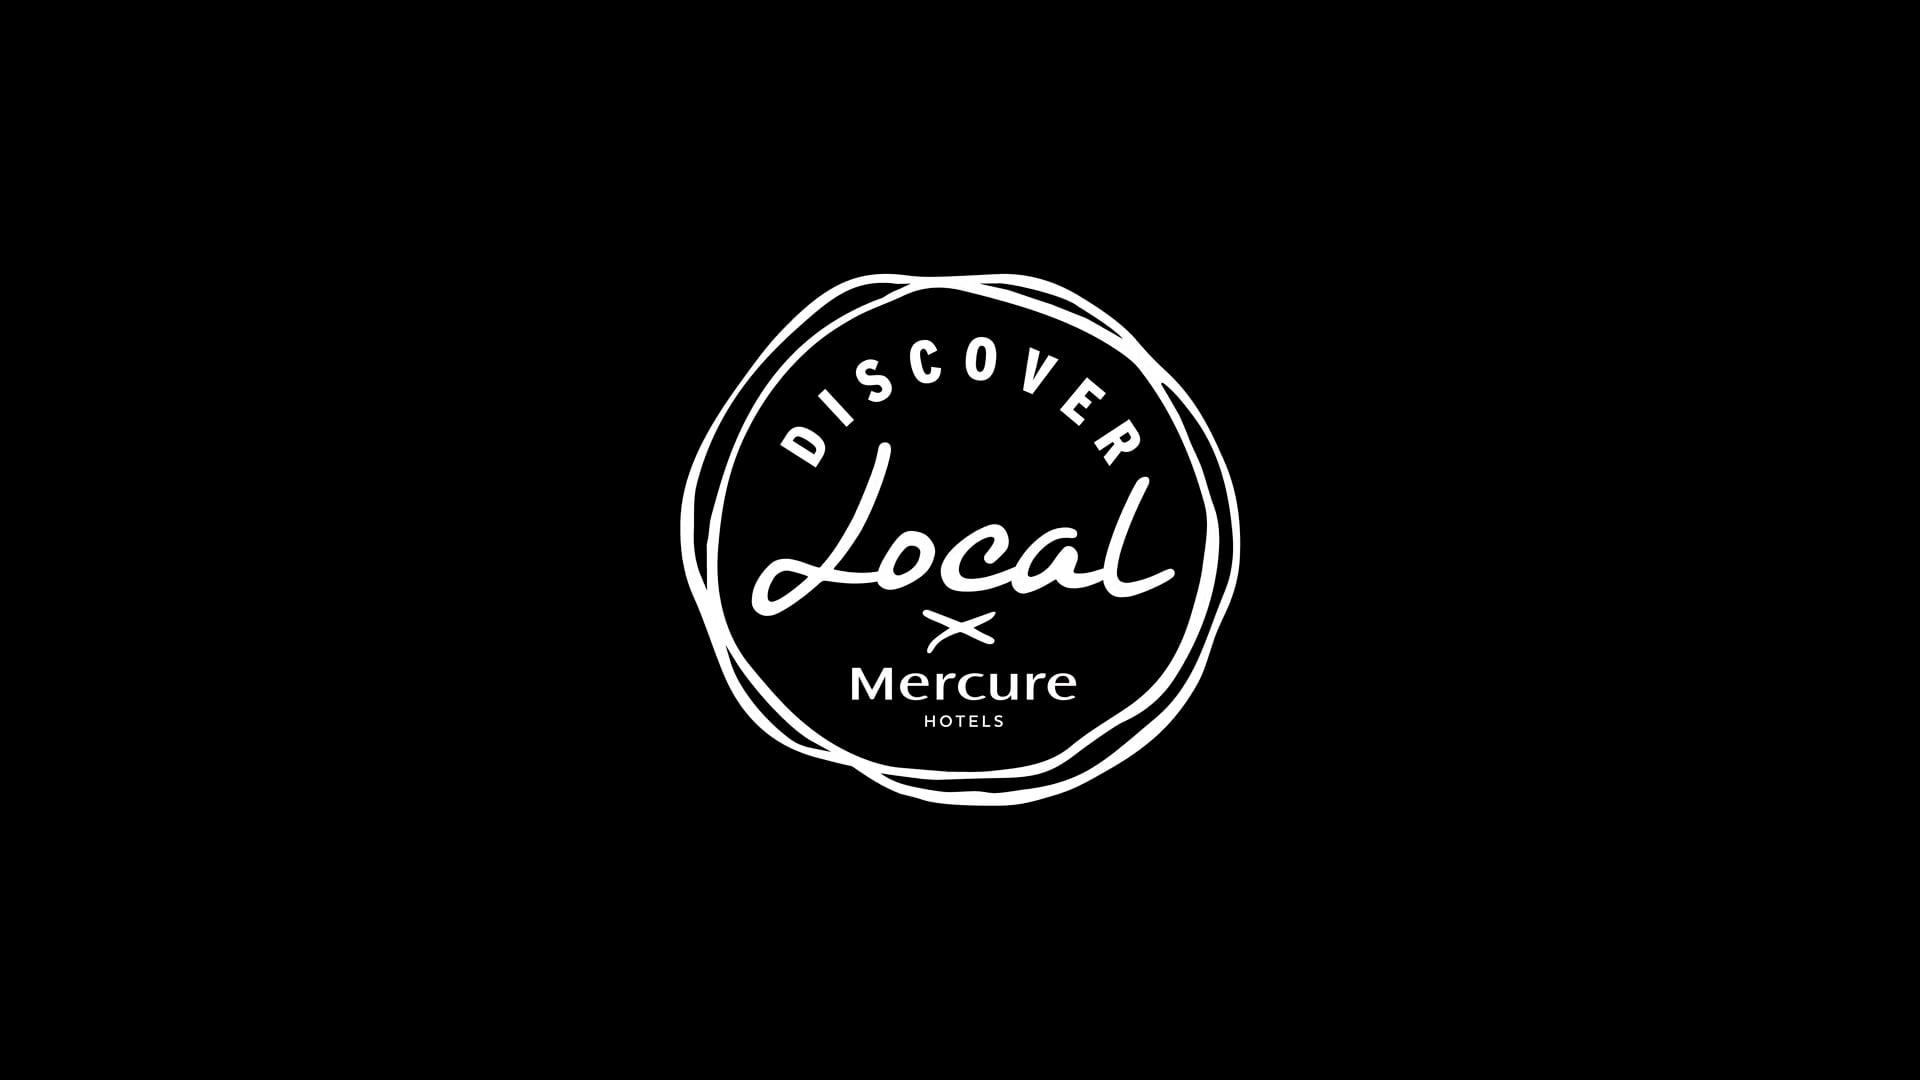 Mercure Hotels - Discover Local Berlin